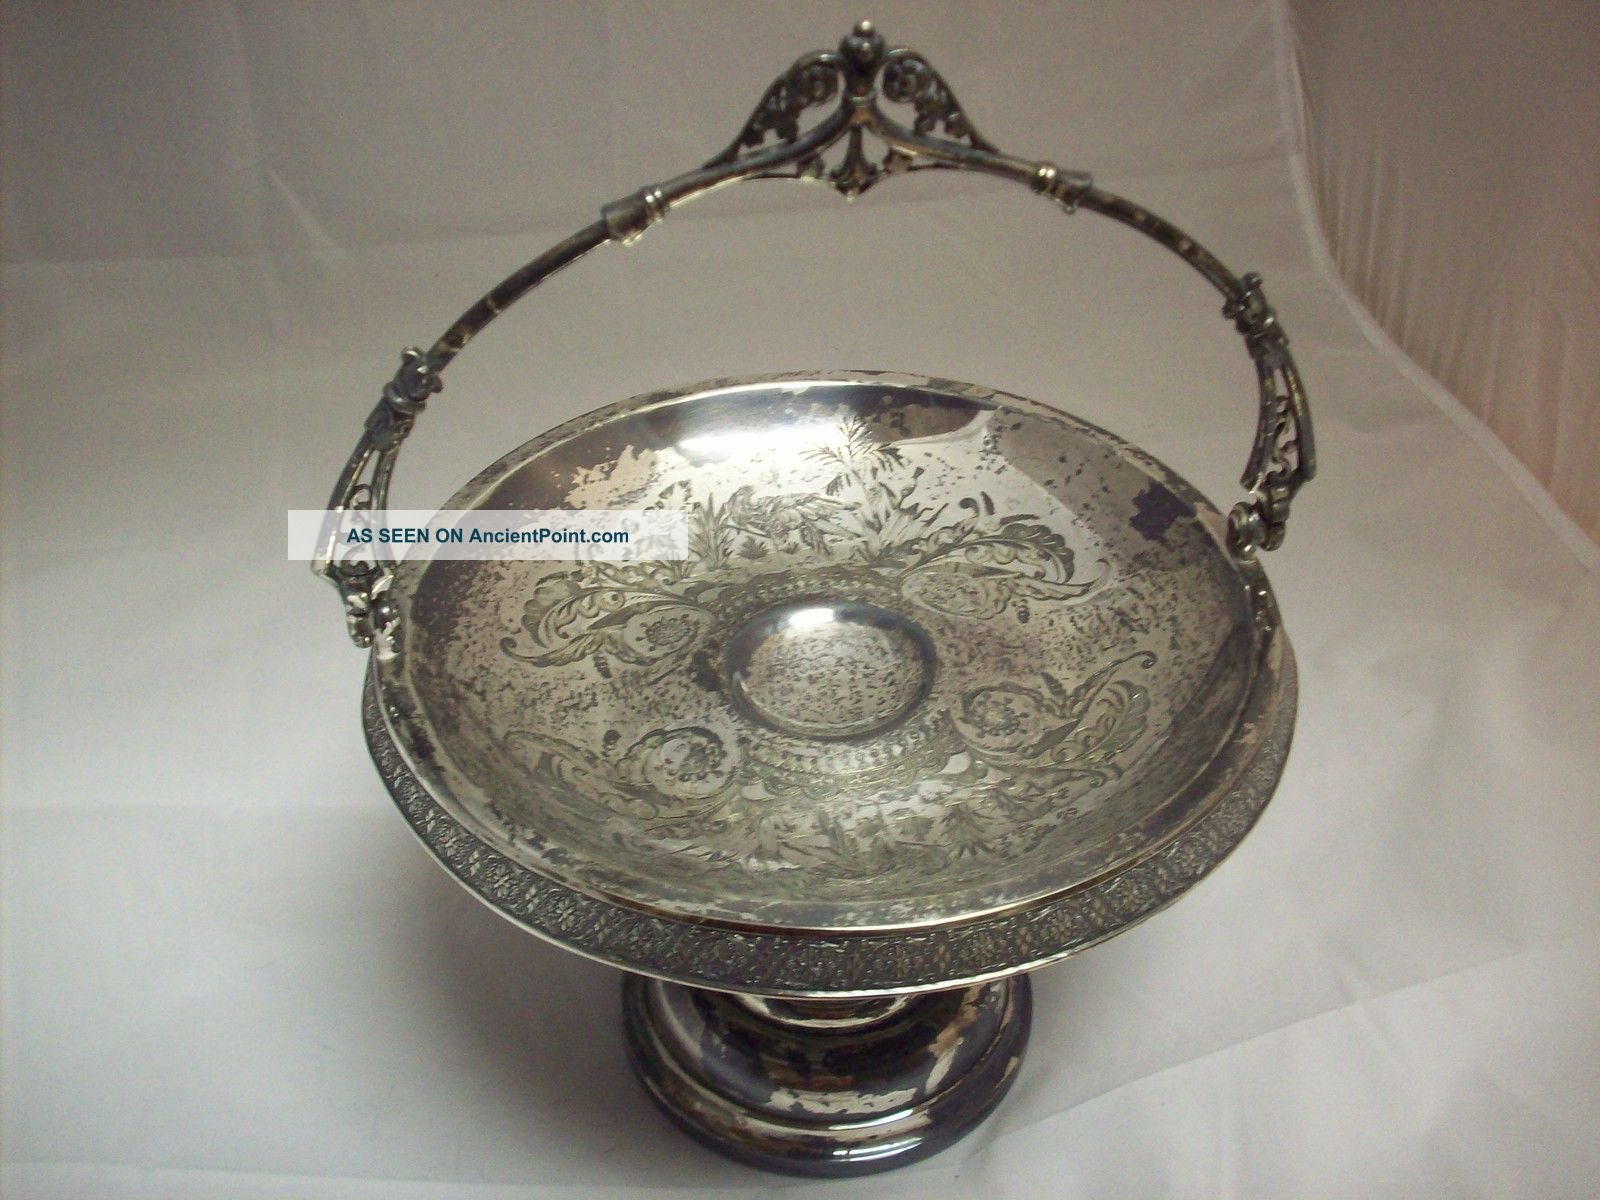 Vintage Simpson Hall Treble Plated Bride ' S Basket With Etched Design Baskets photo